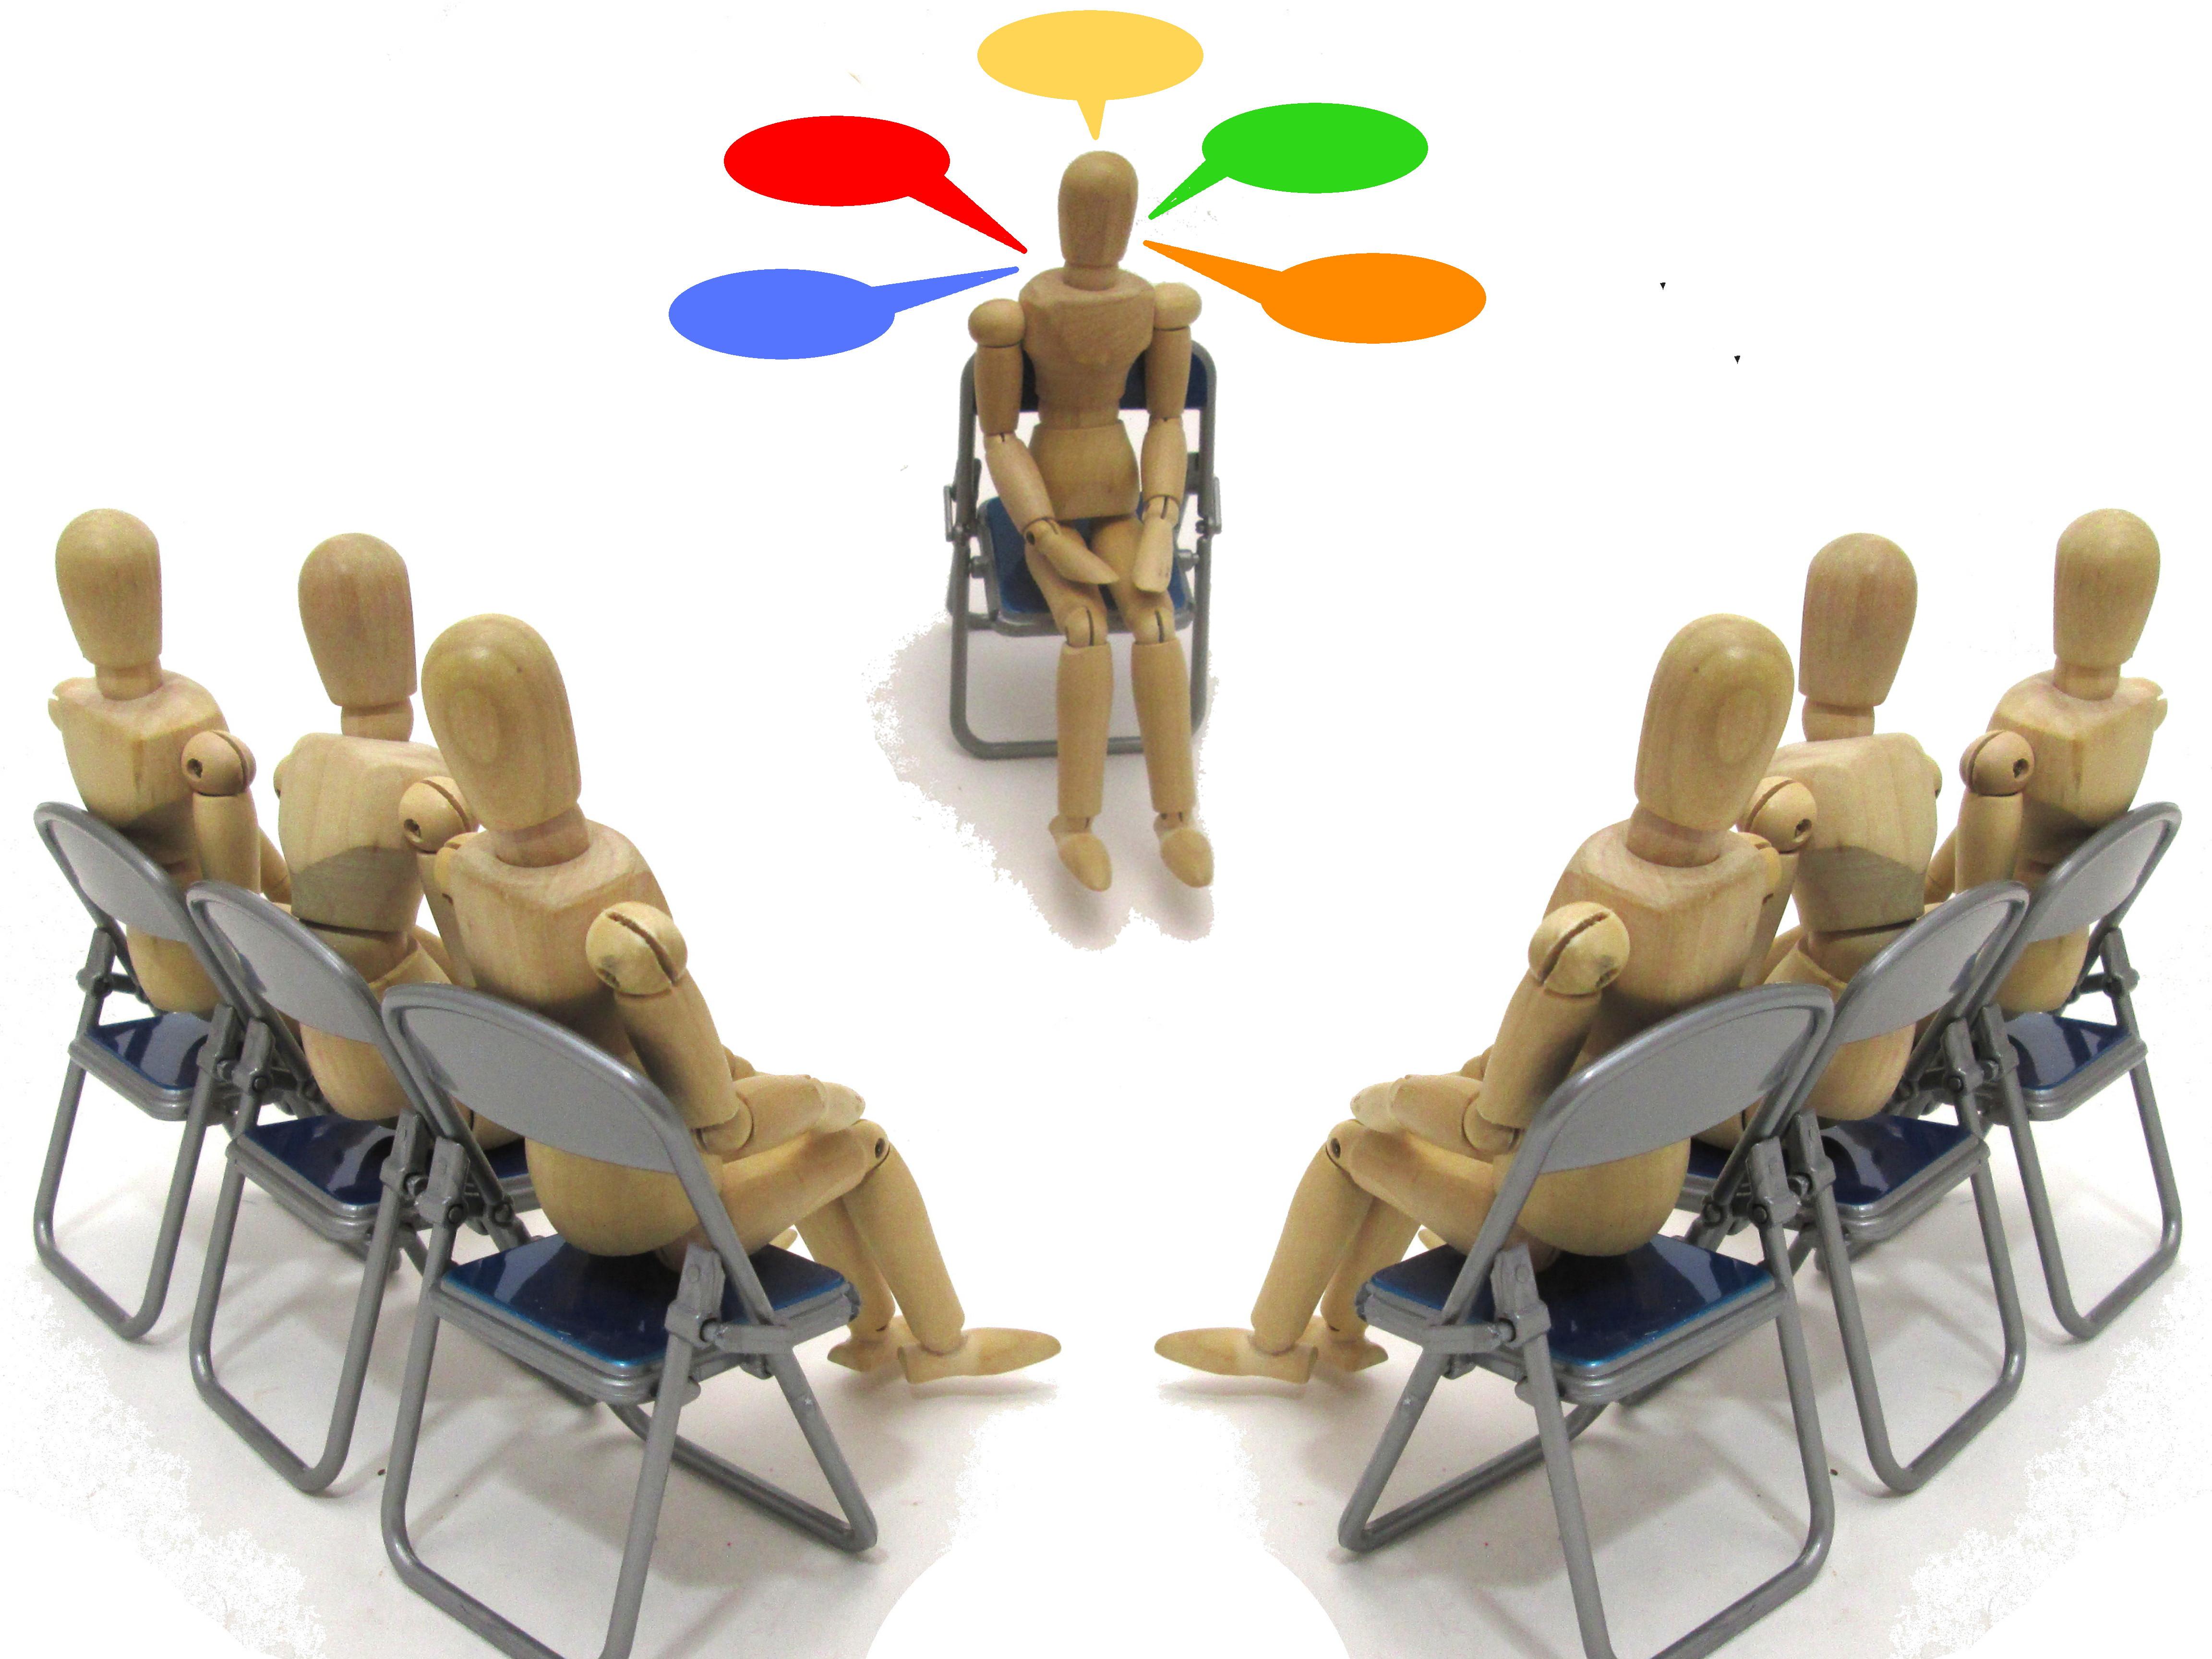 八戸卓球アカデミー 座談会開催